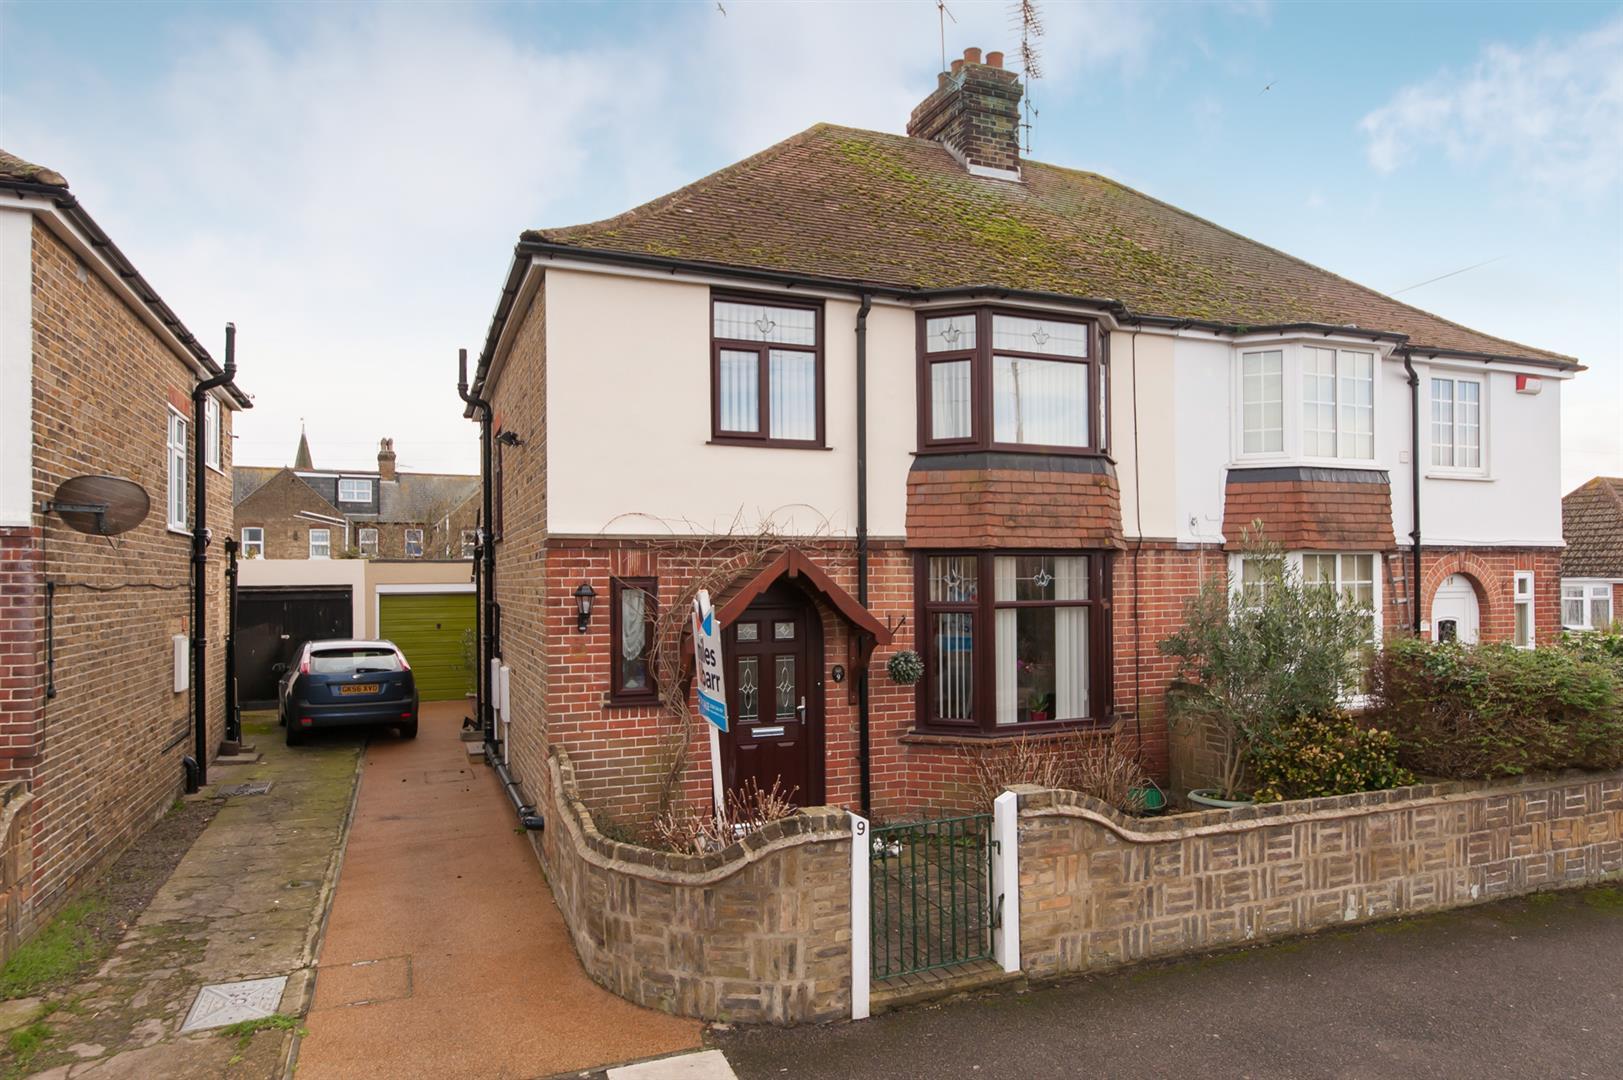 3 Bedrooms Semi Detached House for sale in Eastfield Road, Birchington